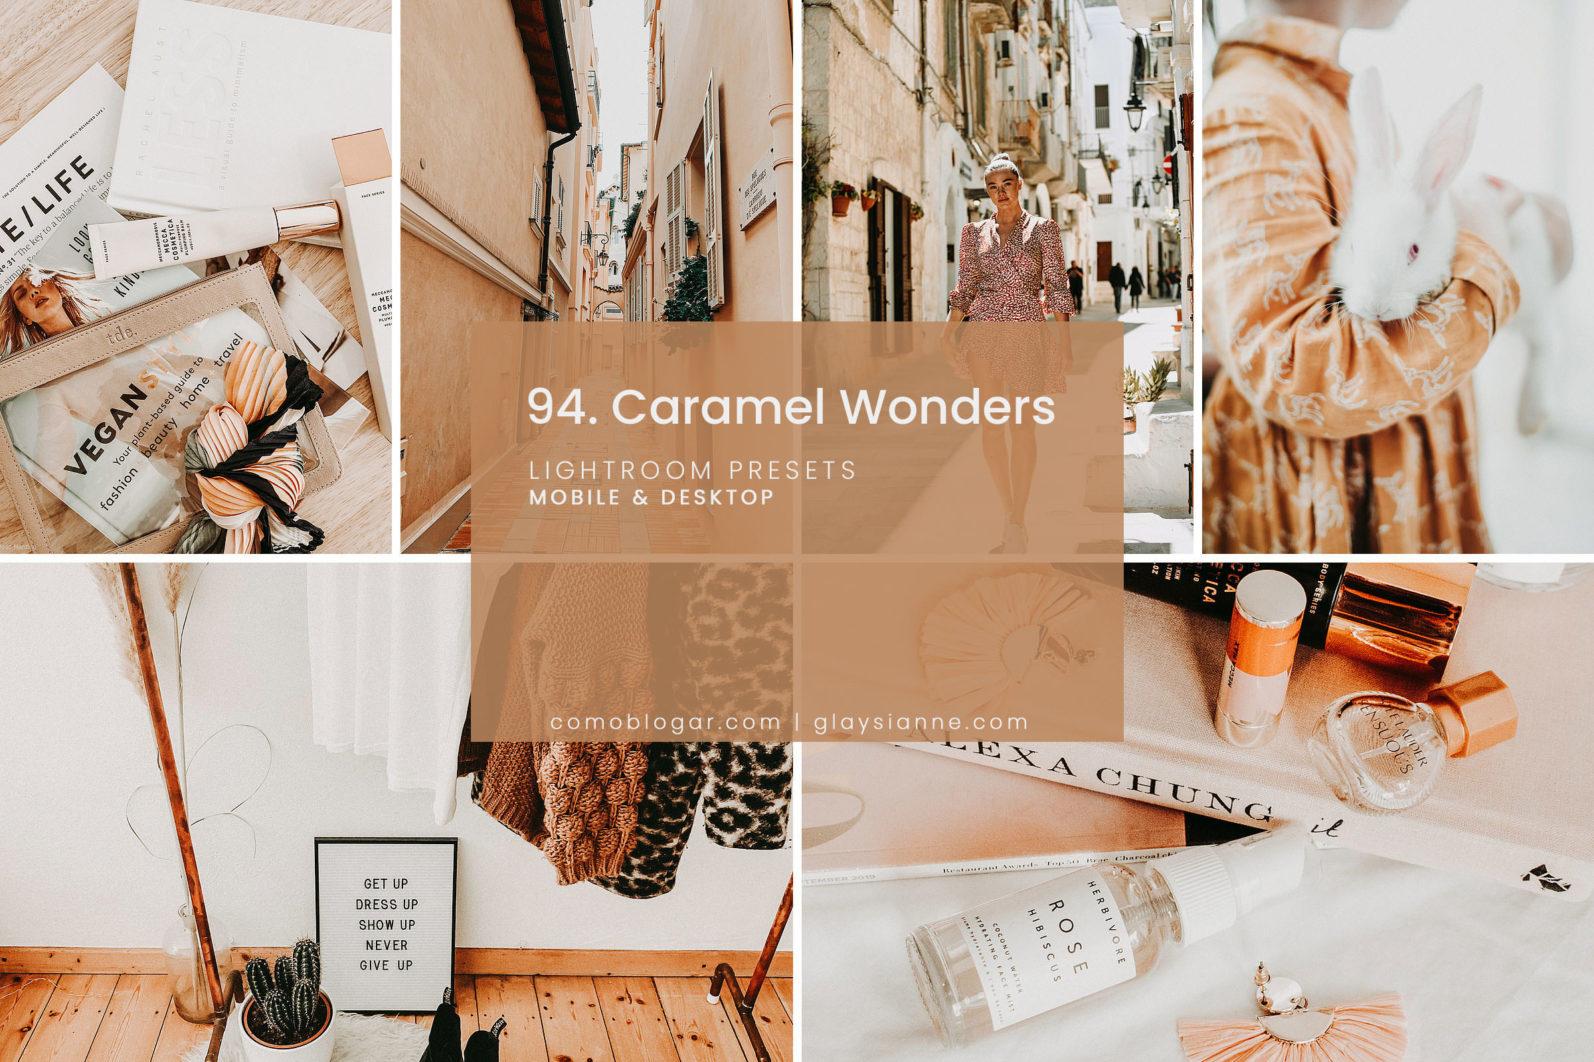 94. Caramel Wonders Presets - 94.Caramel Wonder 01 -